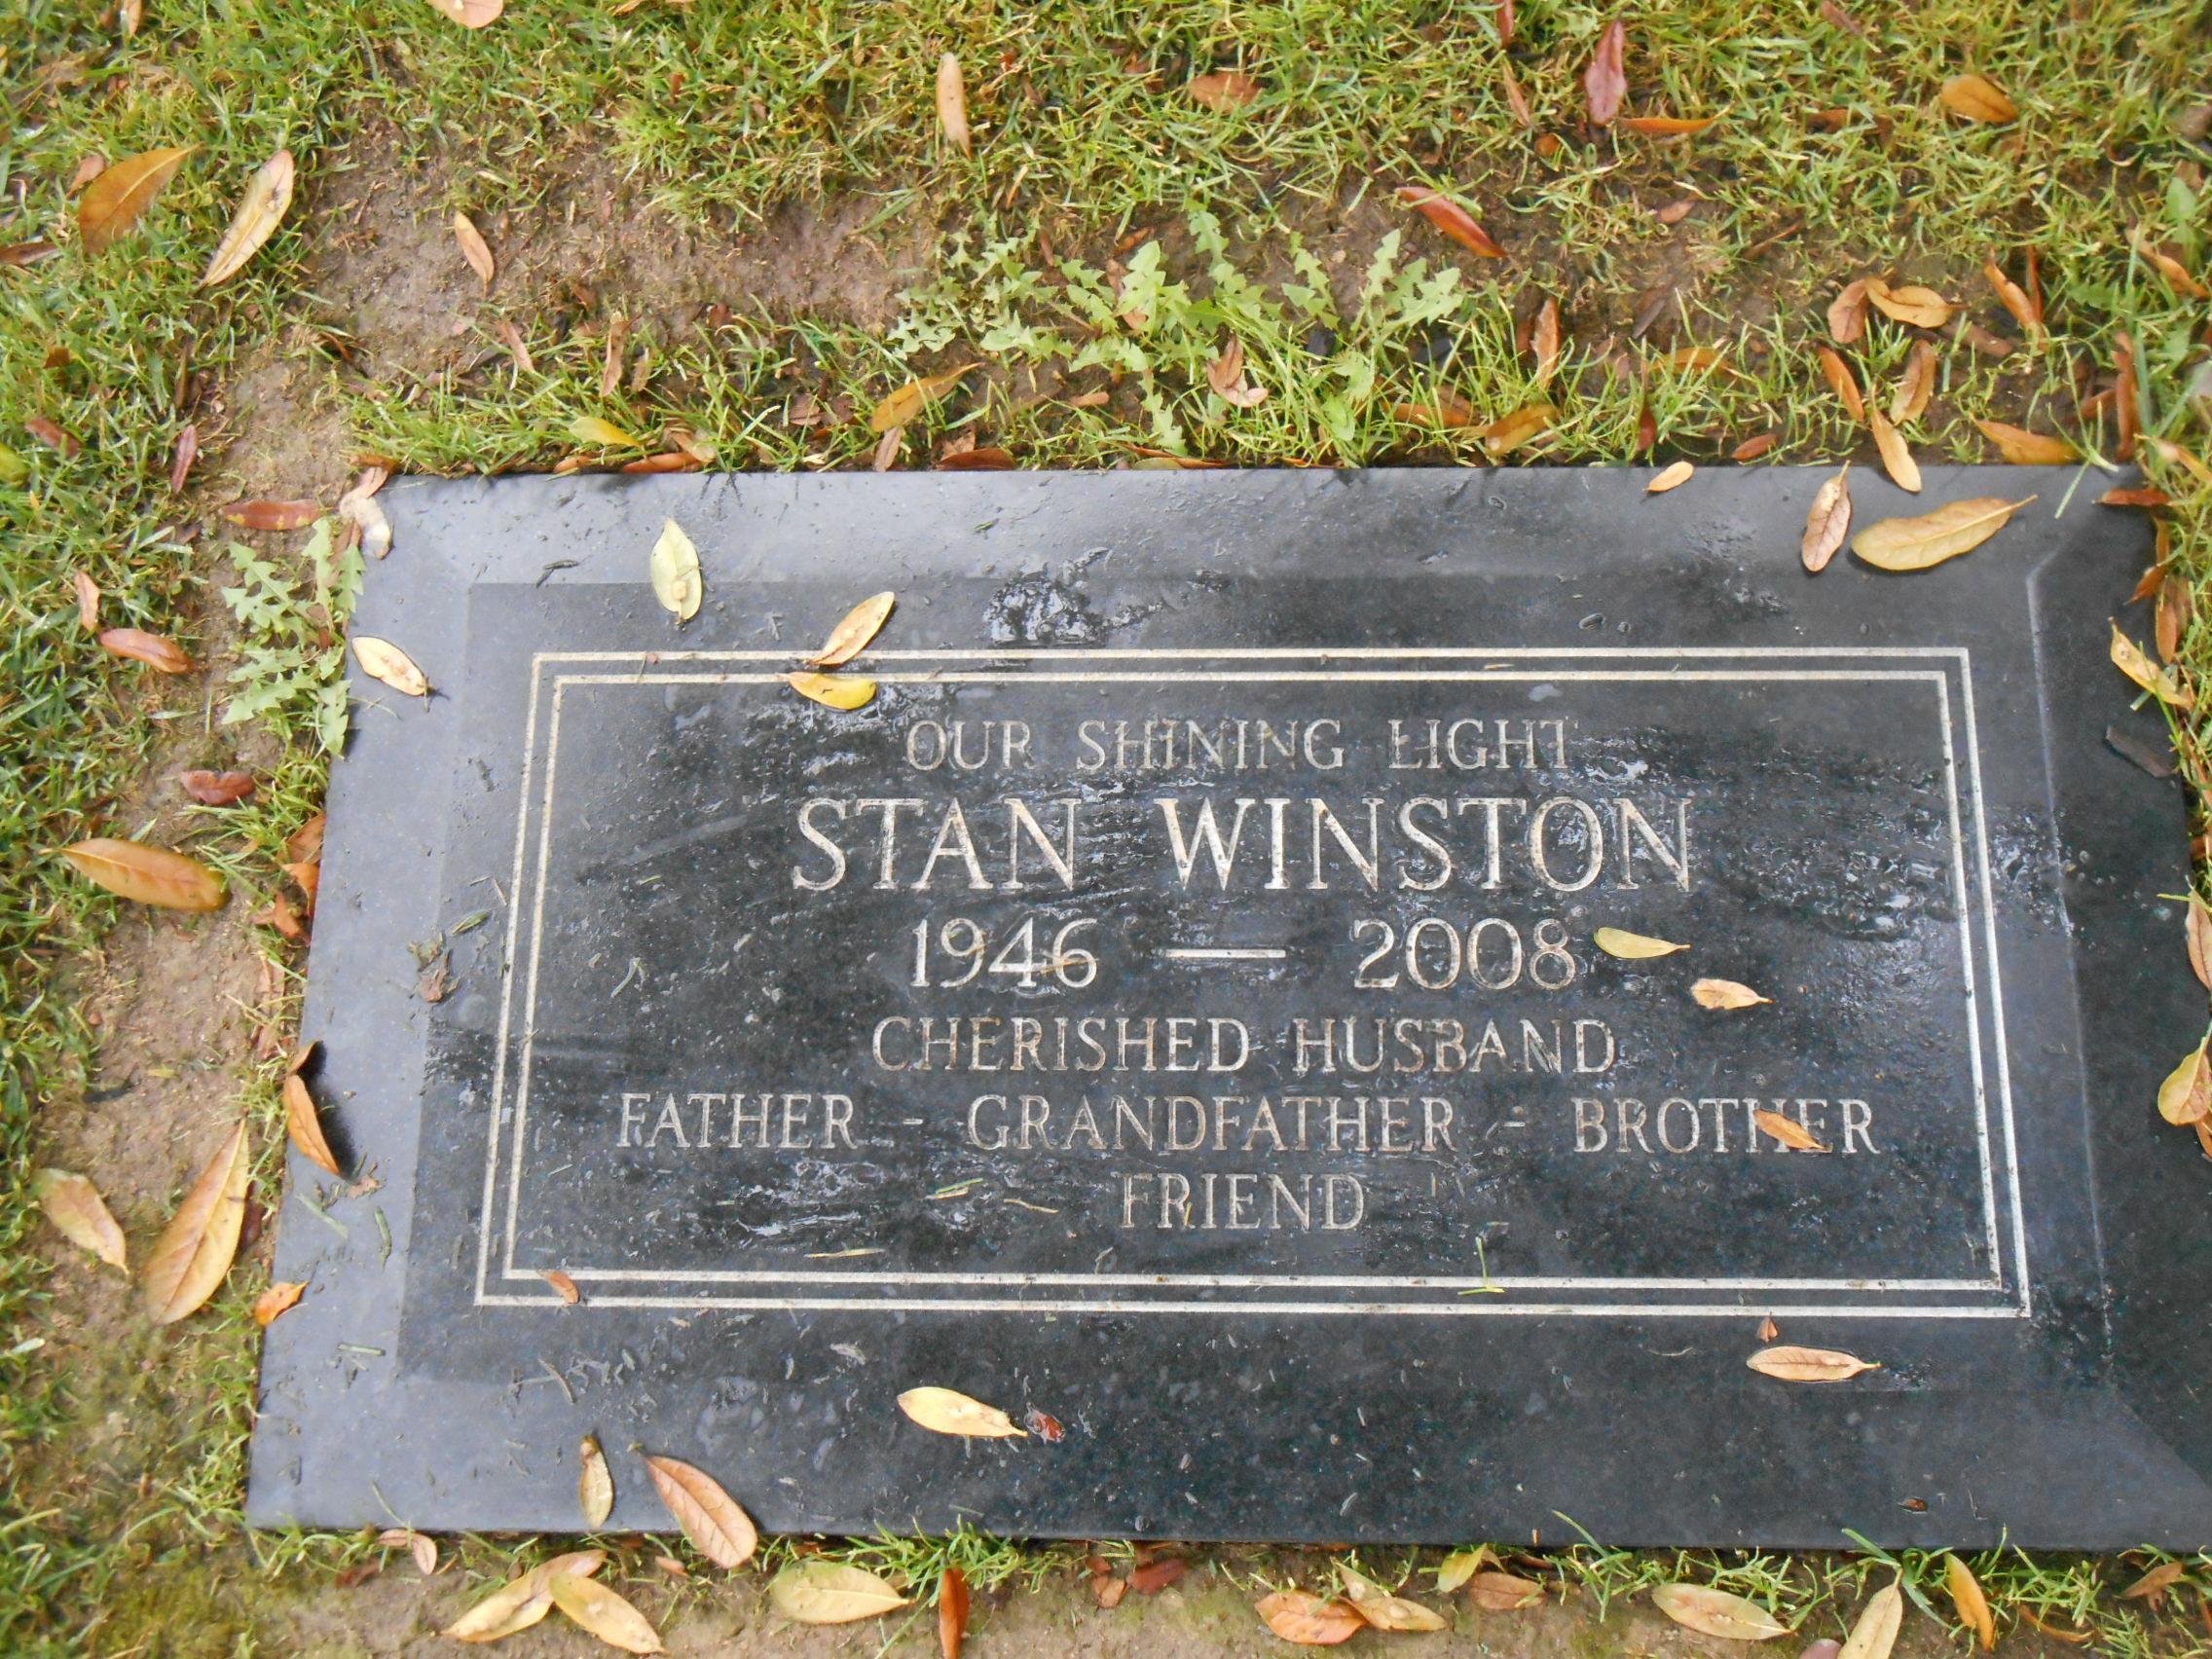 Stan Winston